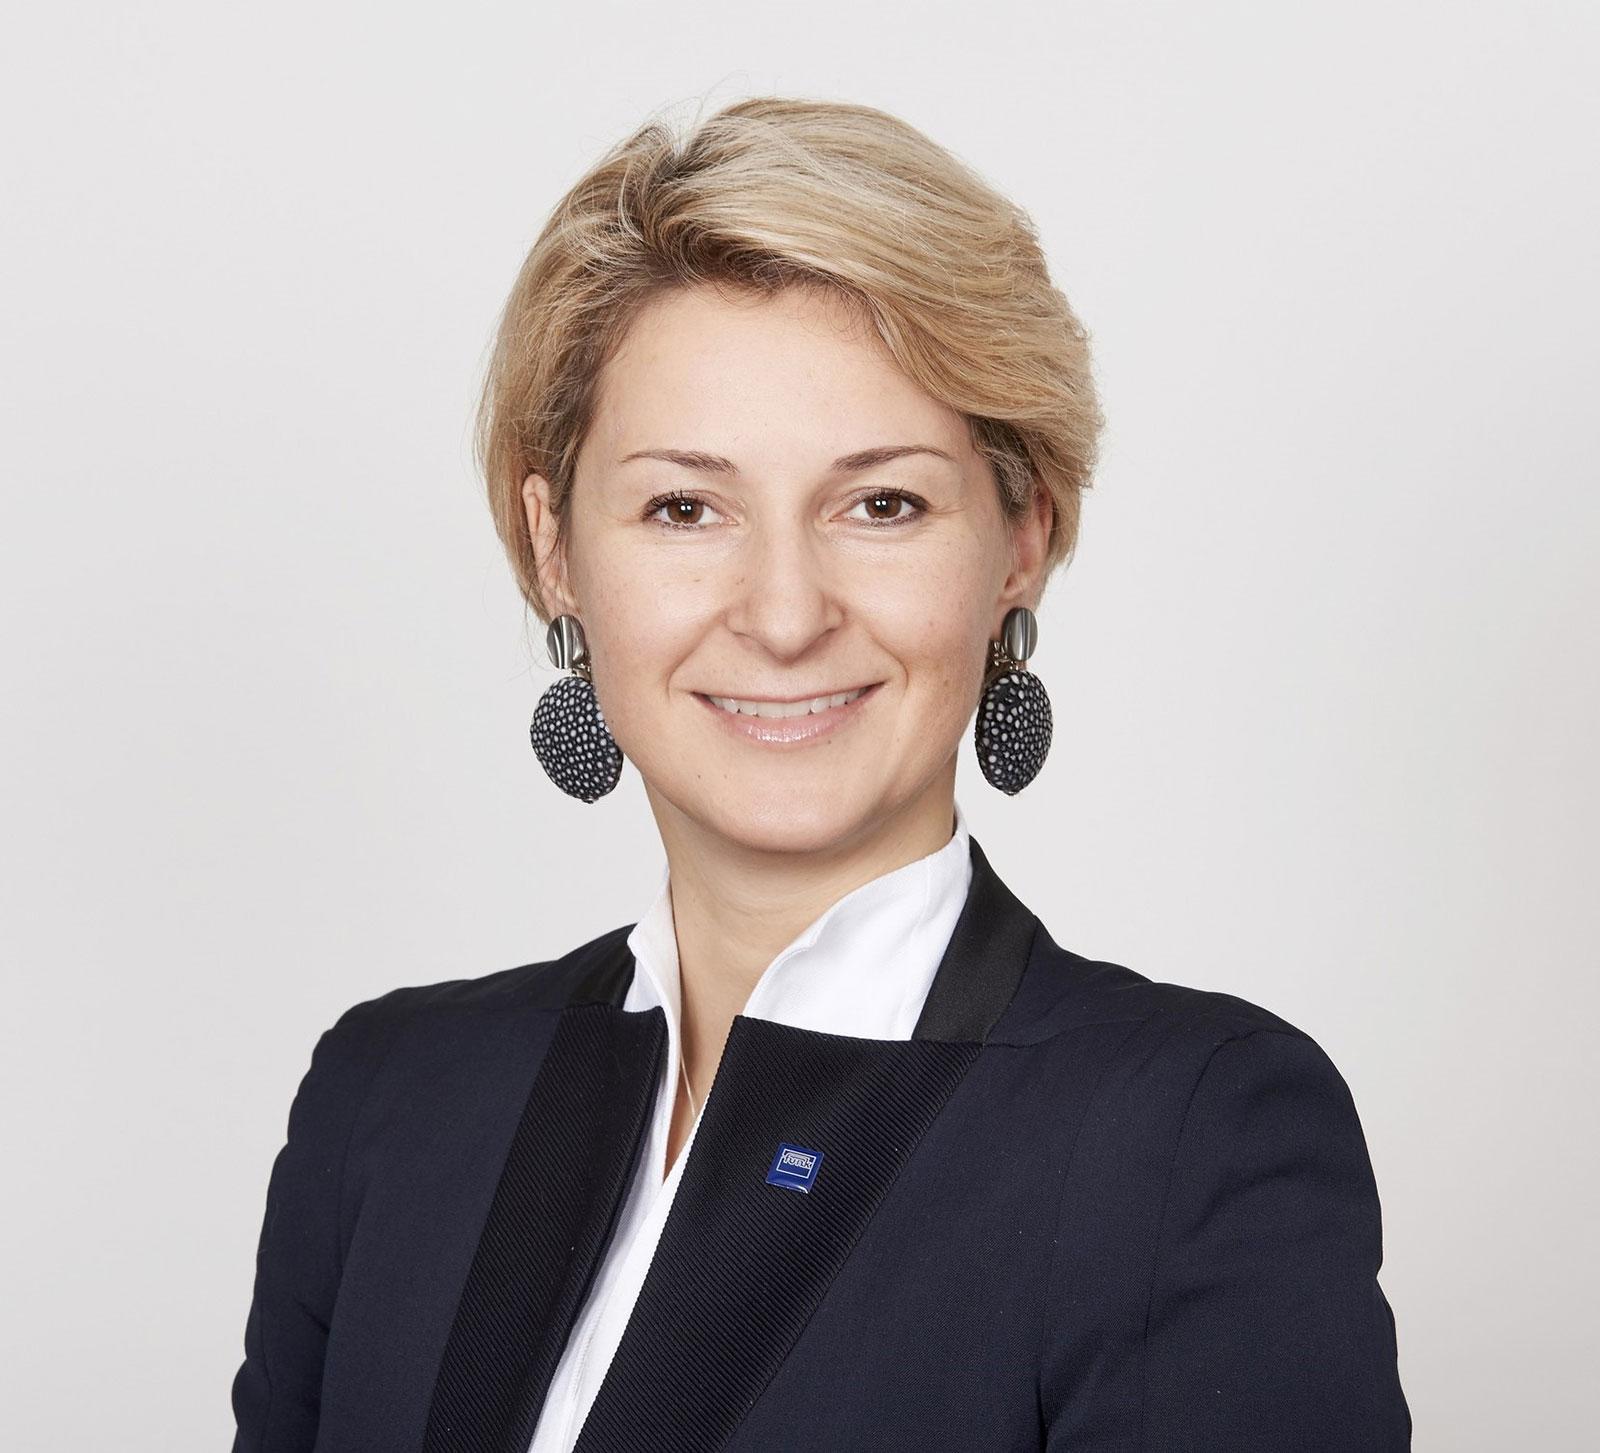 Mag. Ulrike Fiona Domany-Funtan, MBA ist Generalsekretärin des Vereins fit4internet